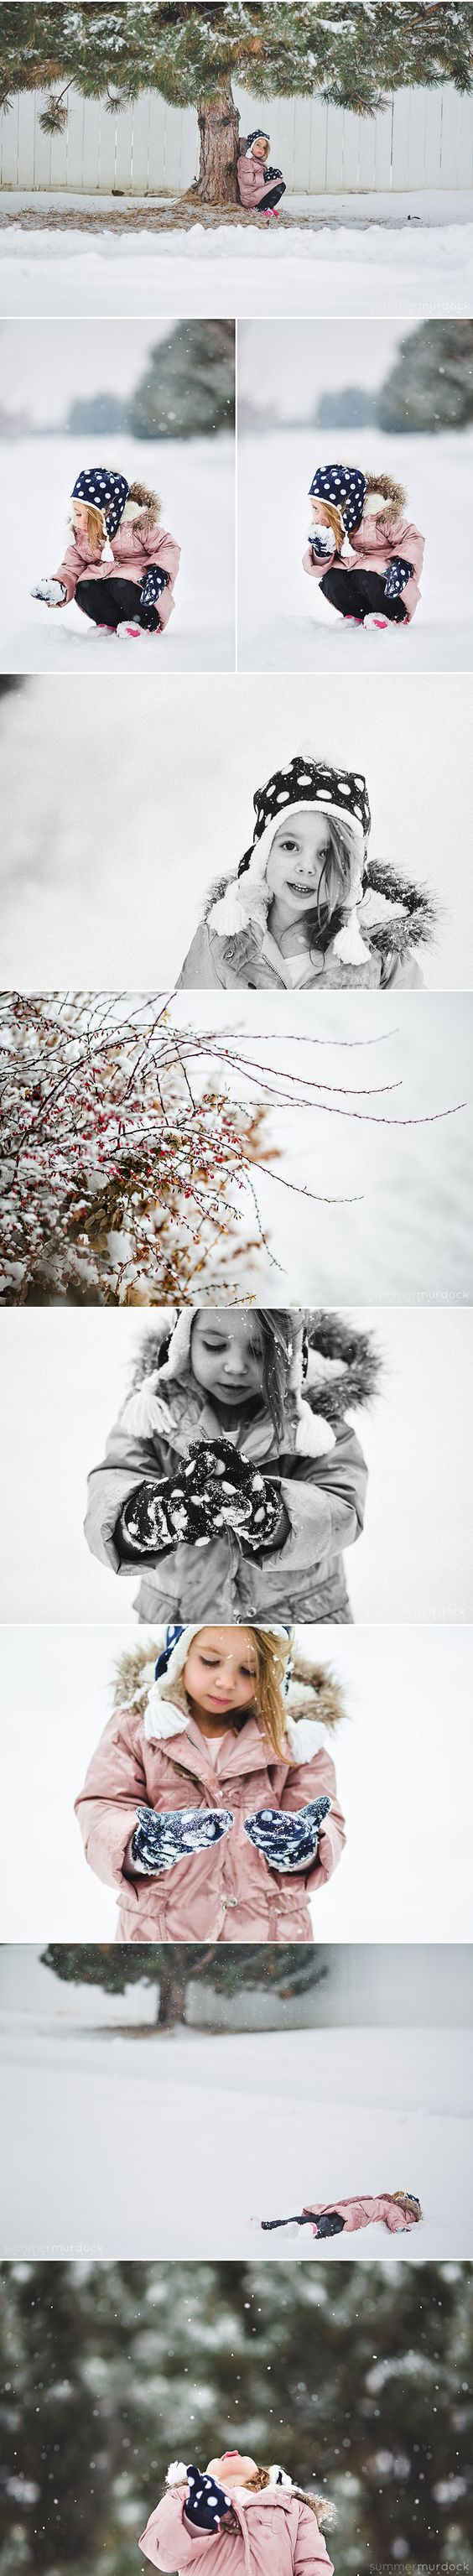 Summer Murdock Photography | snow winter